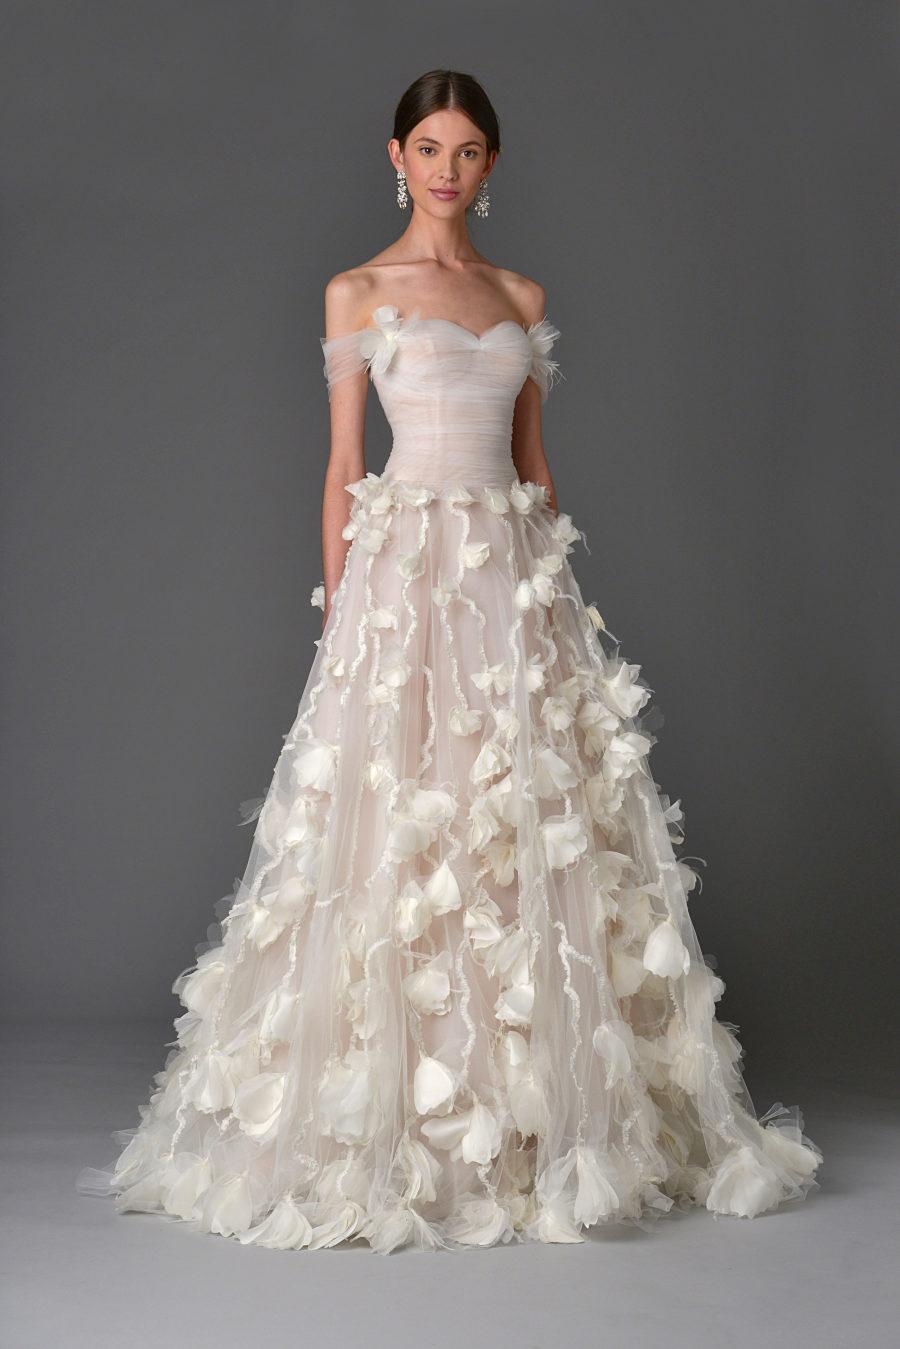 Victorian Gothic Wedding Dresses 45 Spectacular